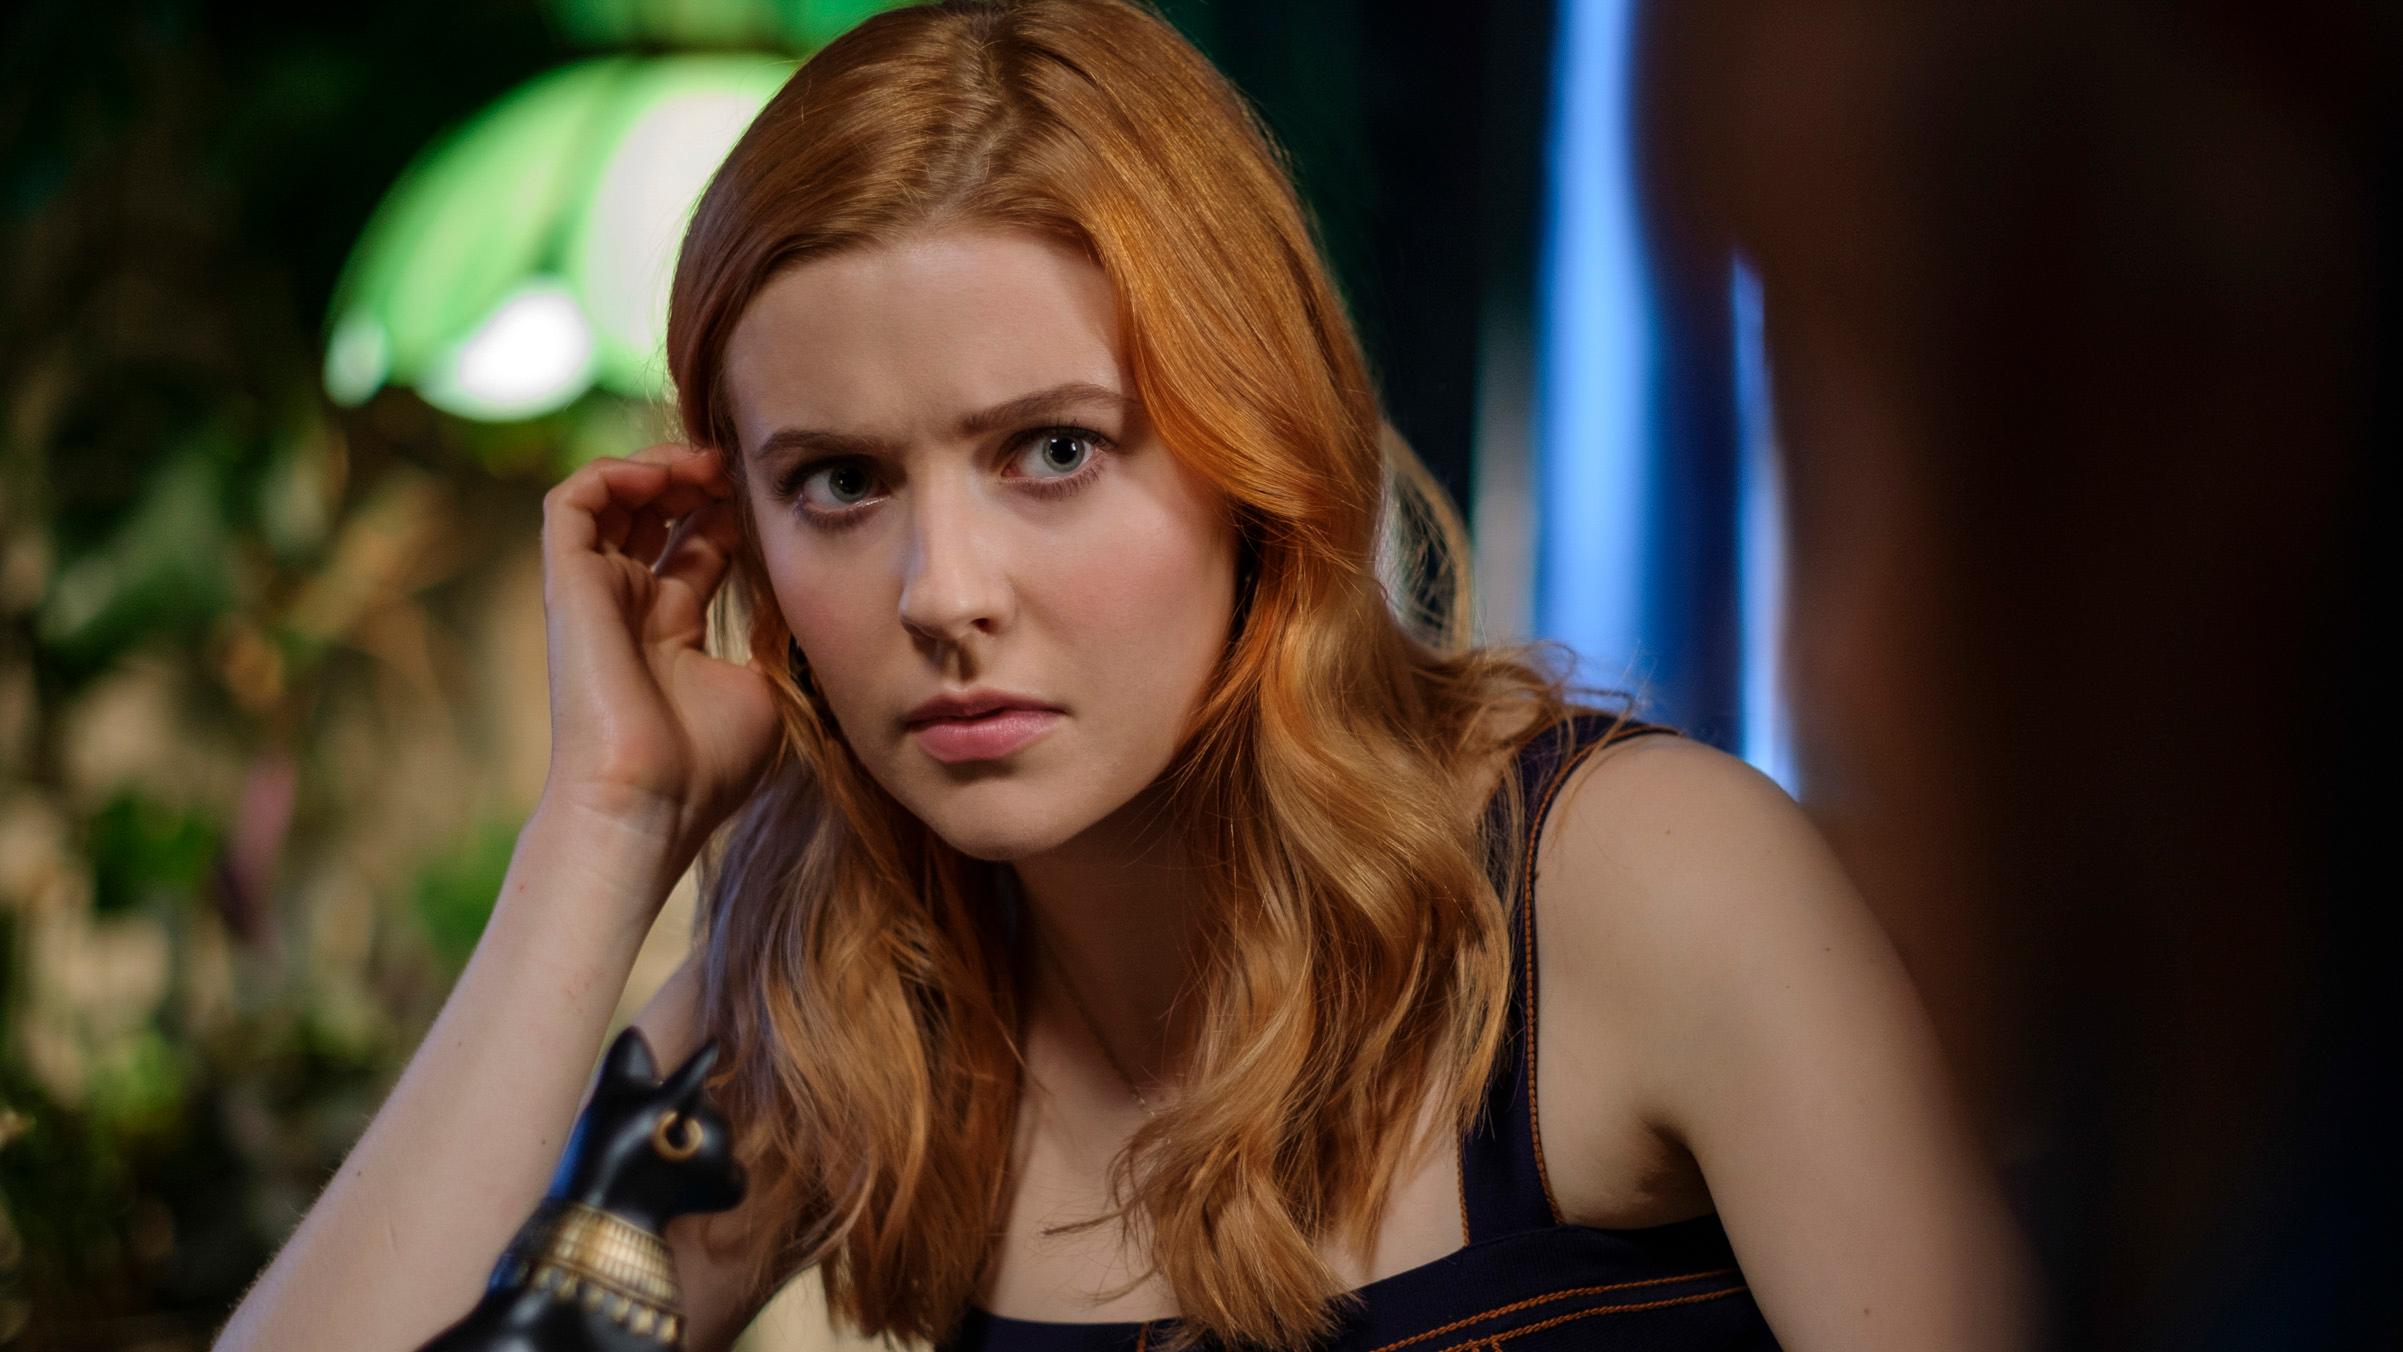 'Nancy Drew' Spinoff Series 'Tom Swift' in Development at CW